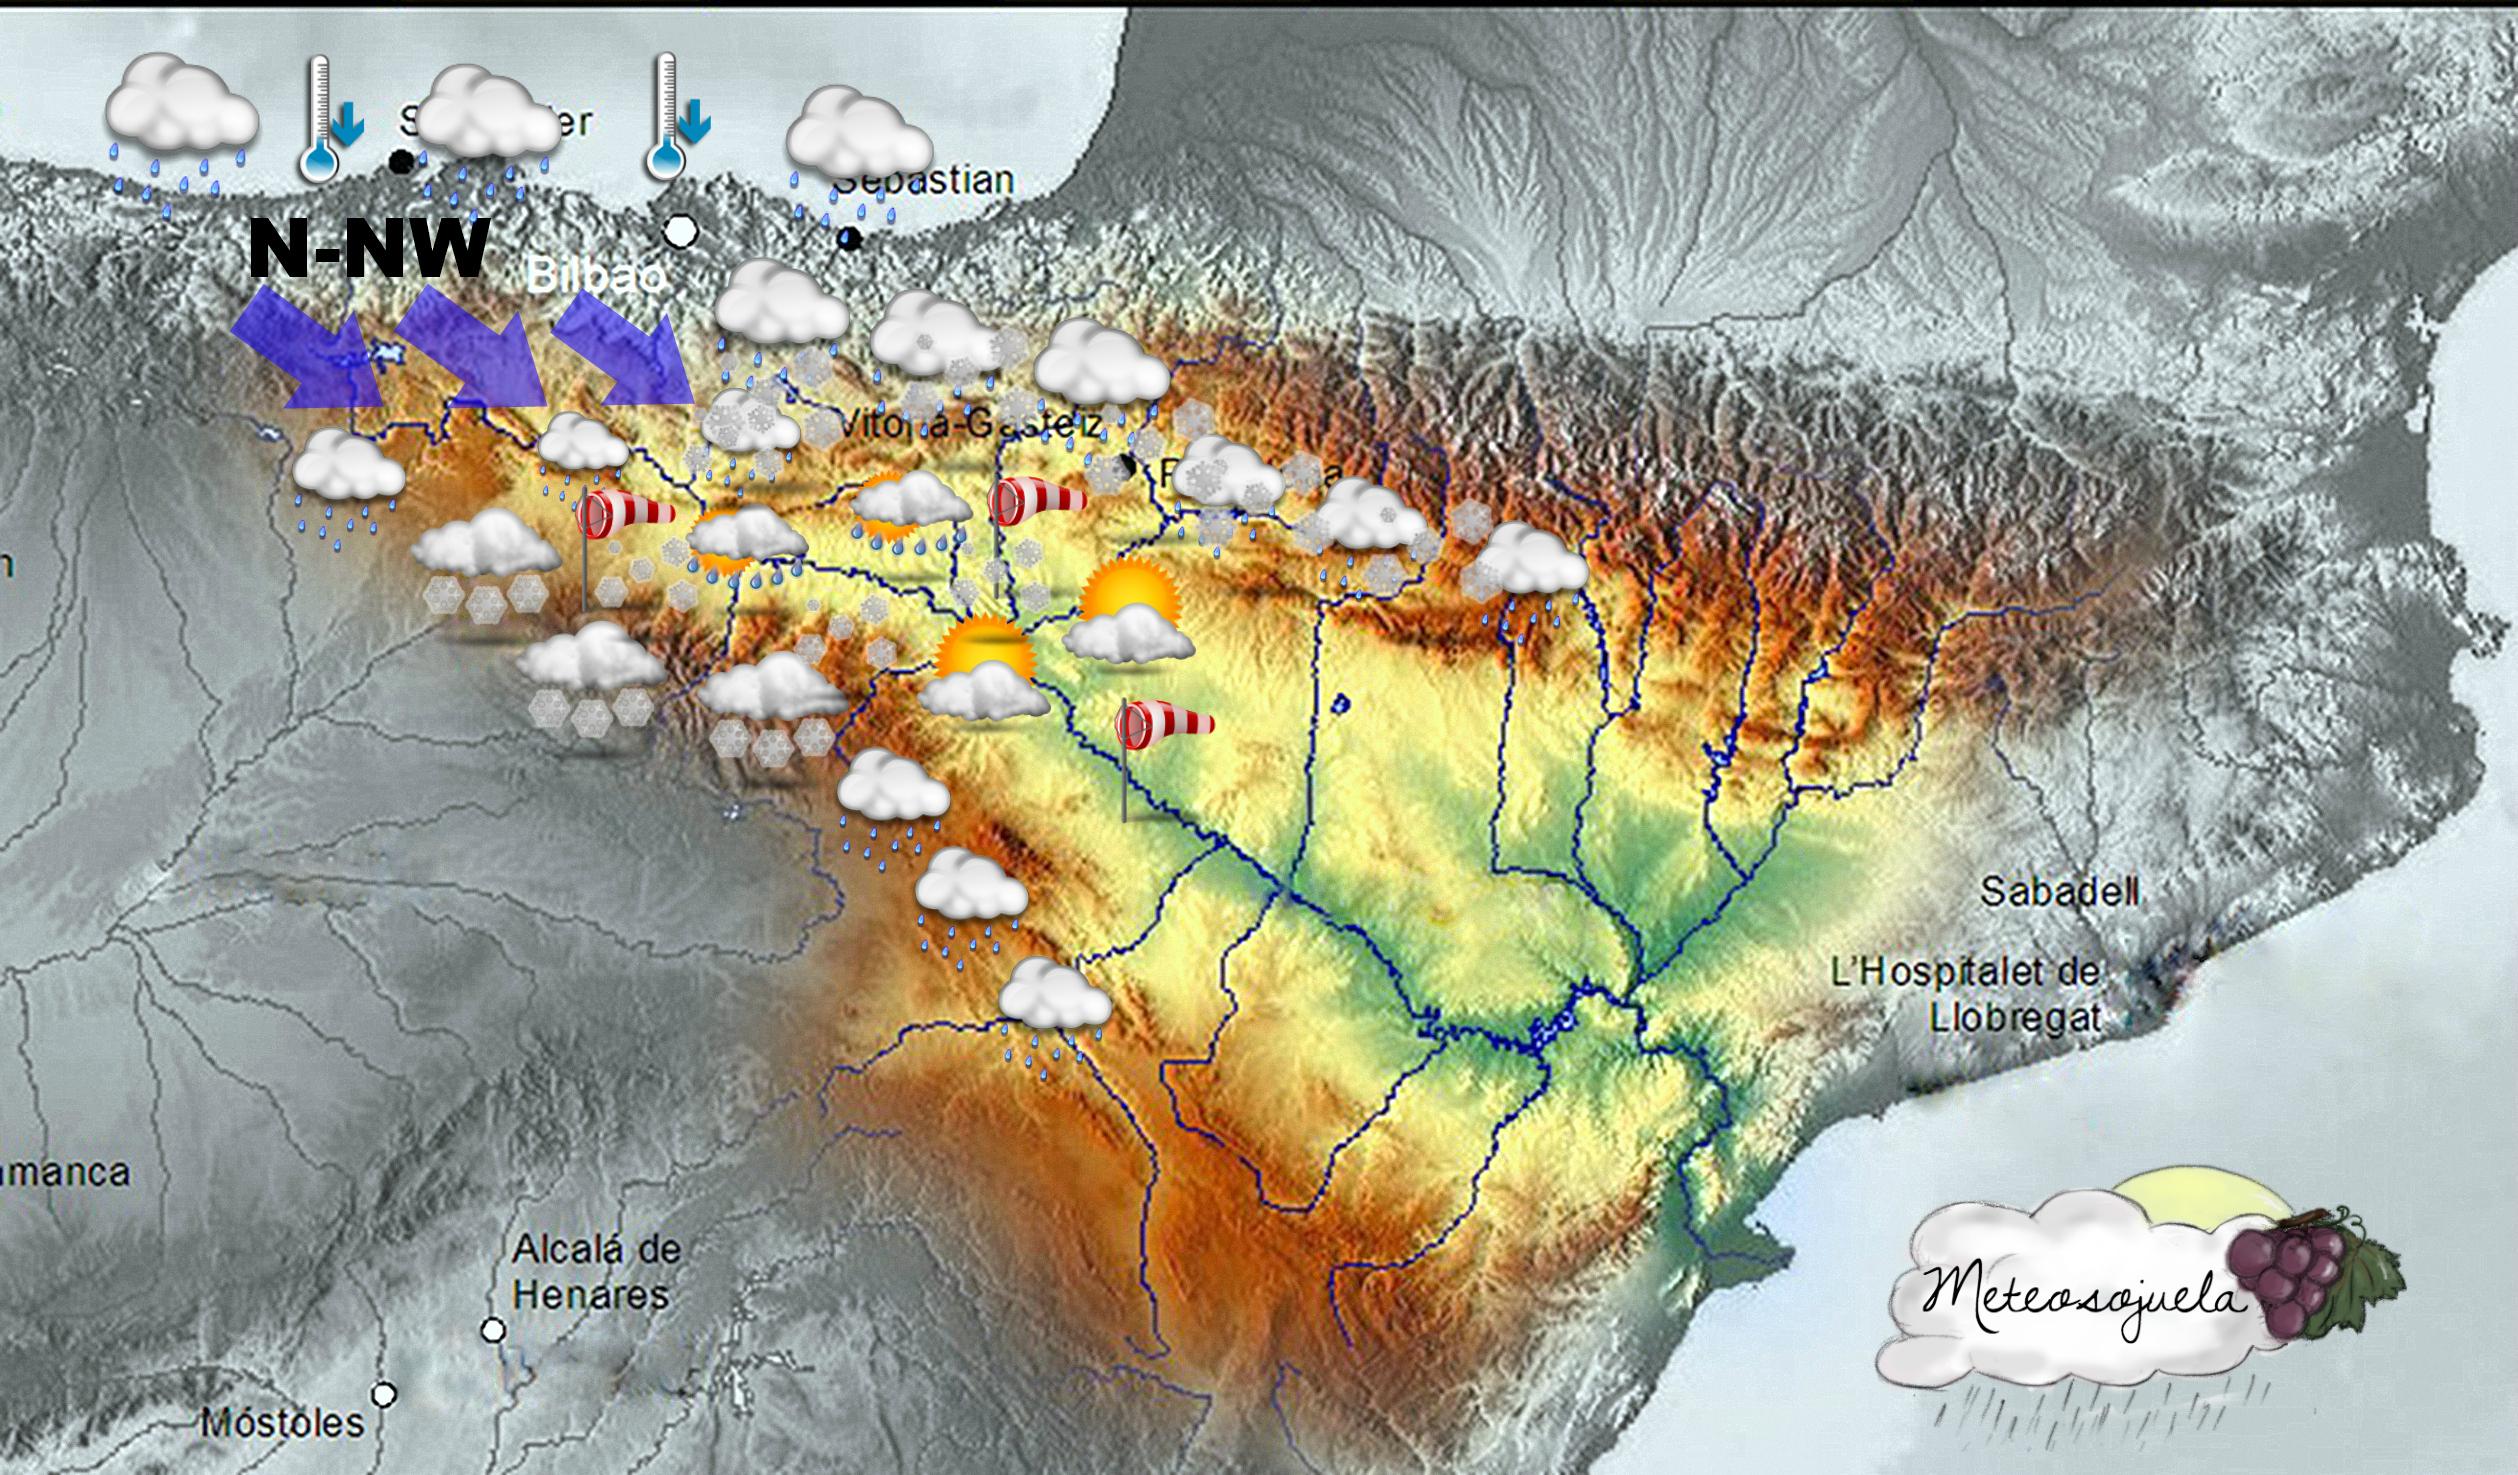 Mapa Significativo Valle del Ebro. NW. Meteososjuela La Rioja